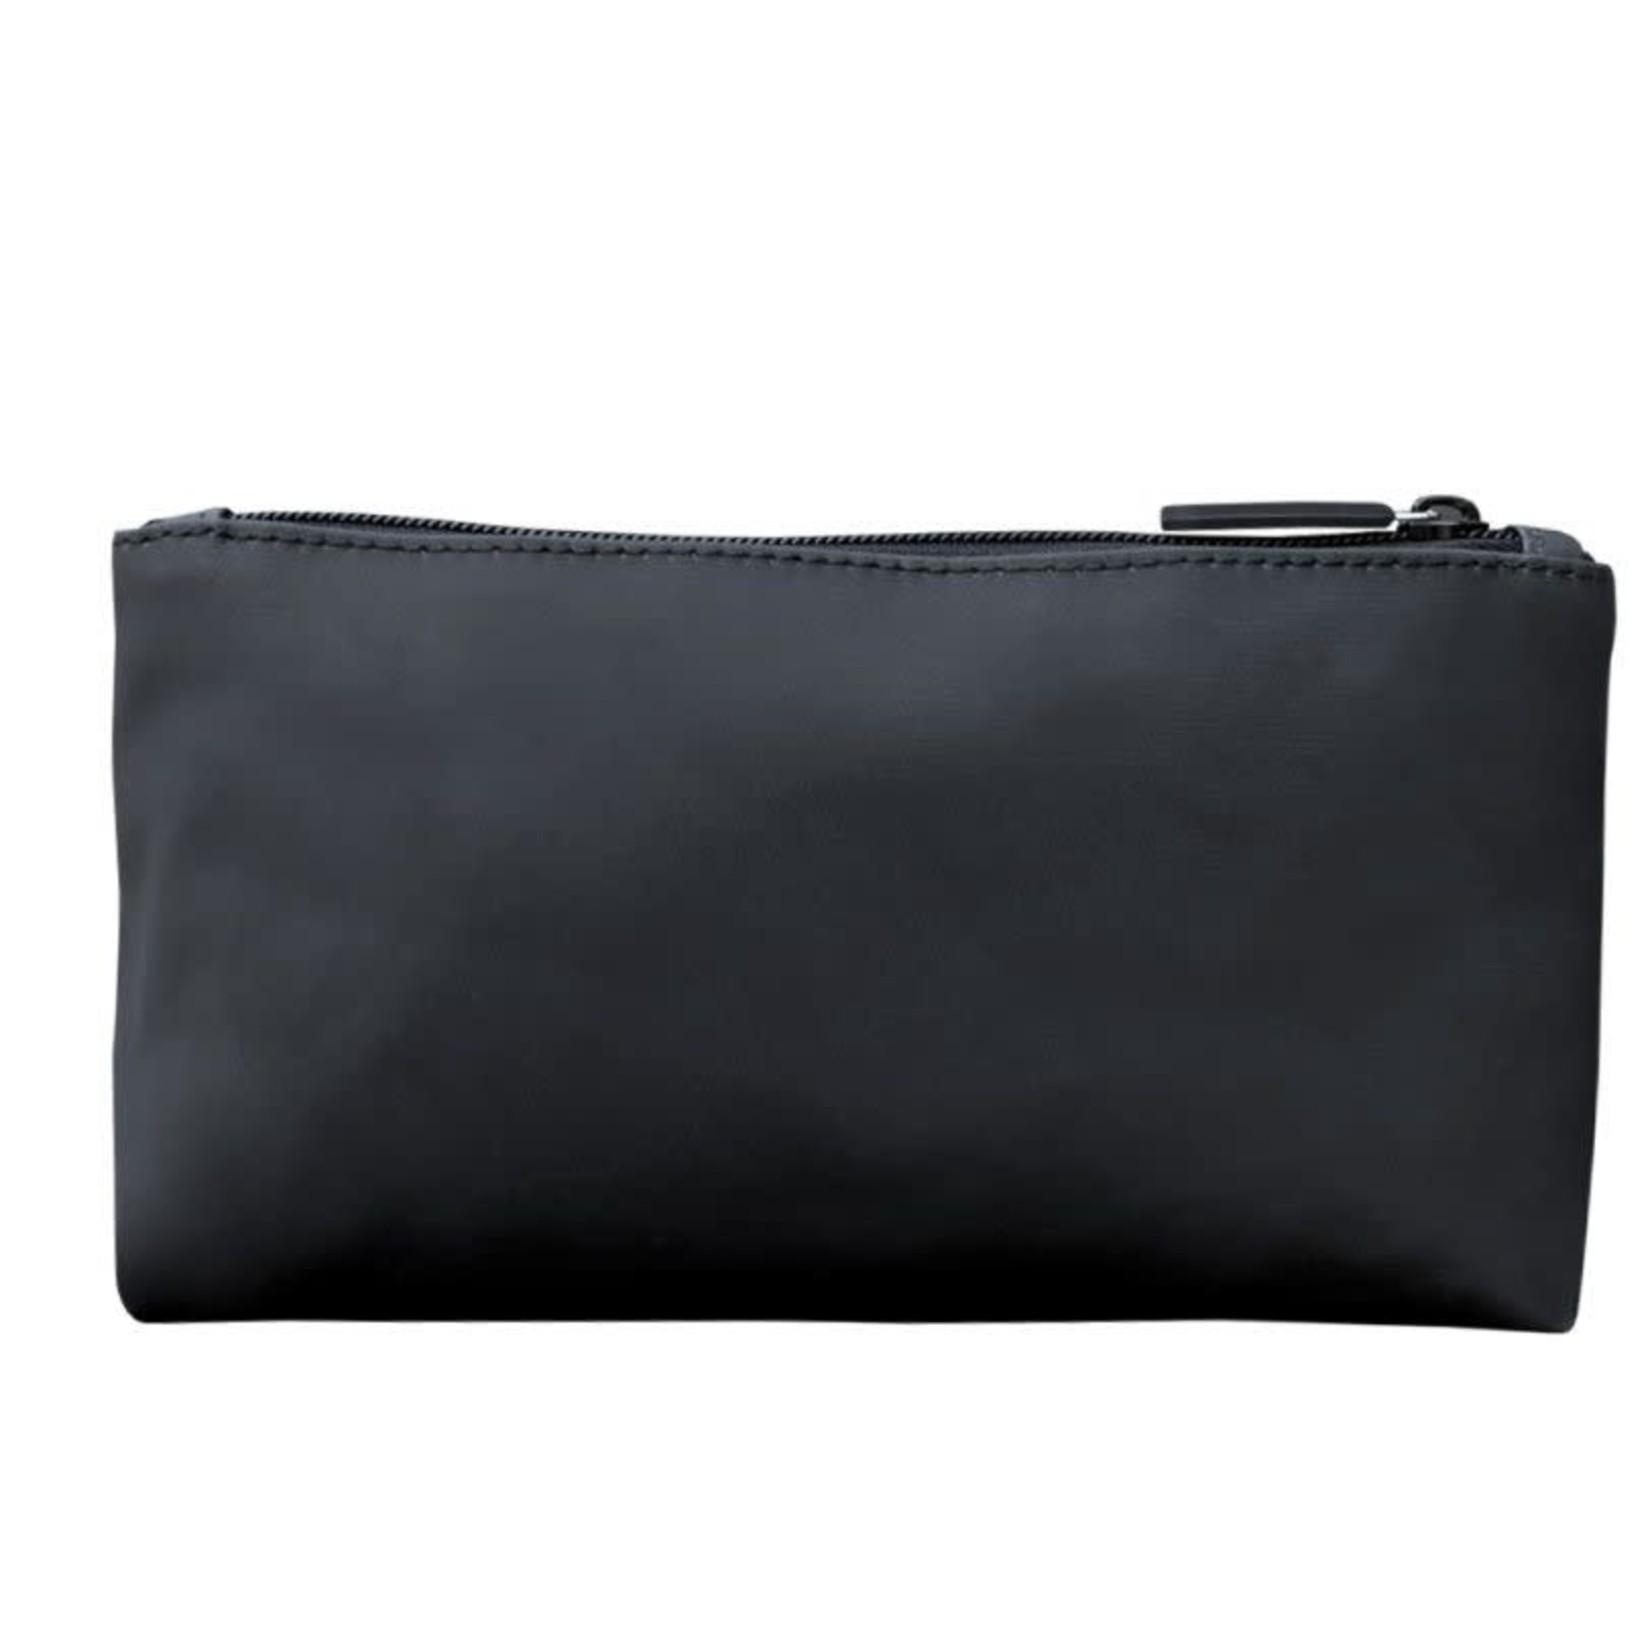 Basiks.Co Basiks.Co : Versatile Pouch,Black,O/S